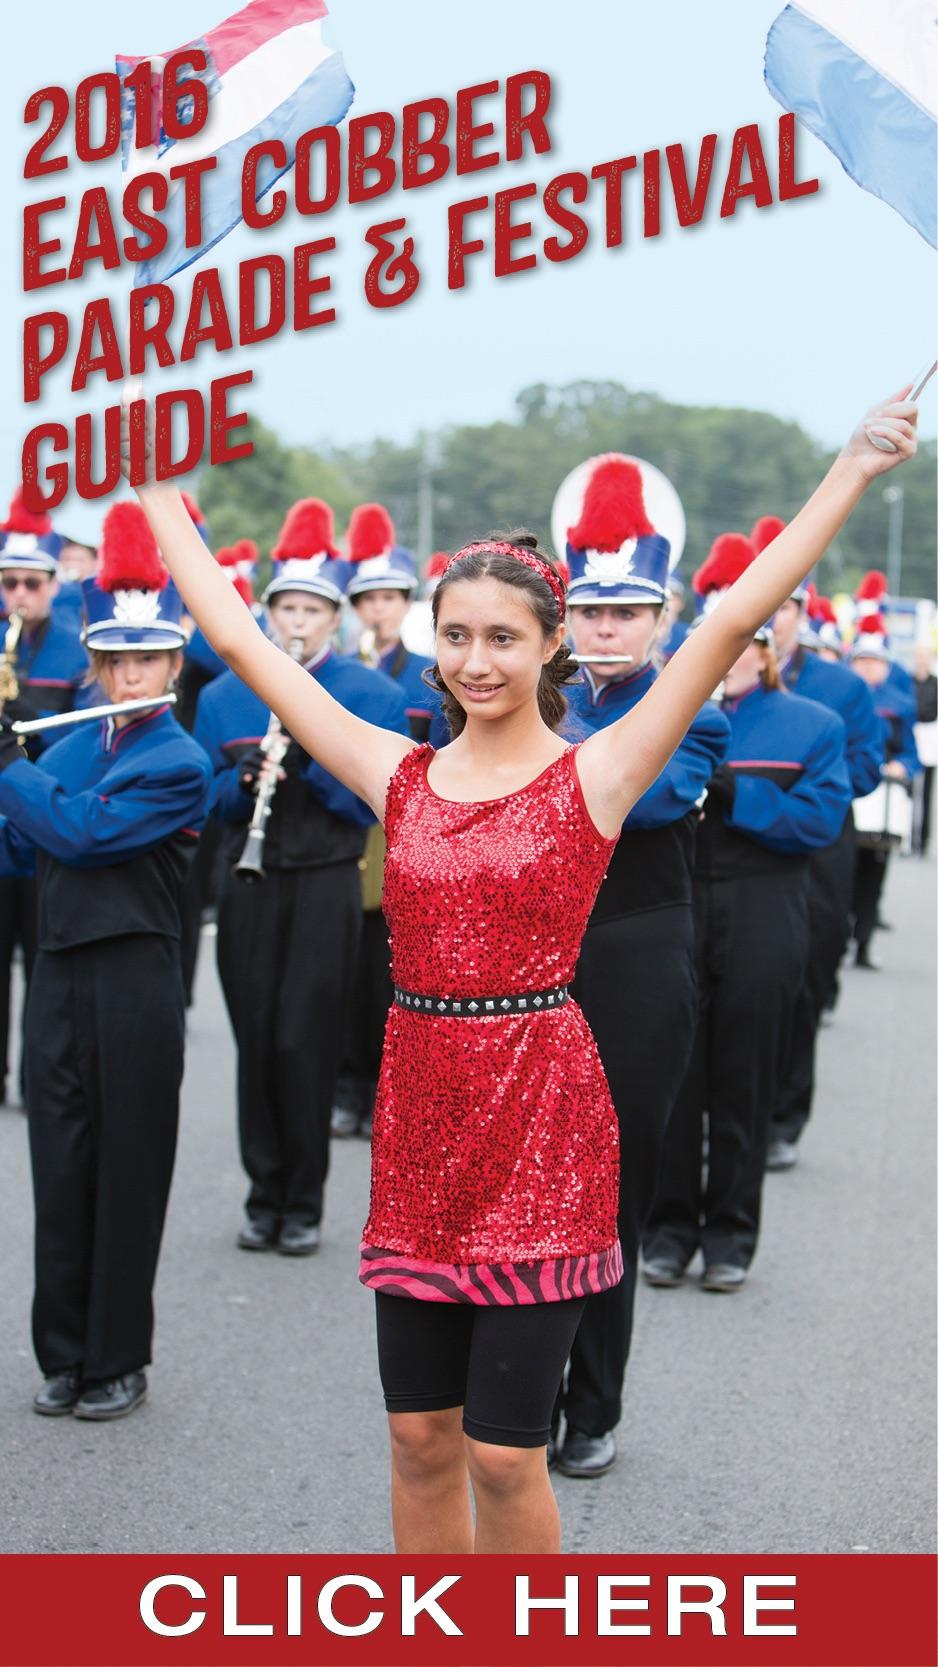 EastCobber Parade & Festival Guide 2016